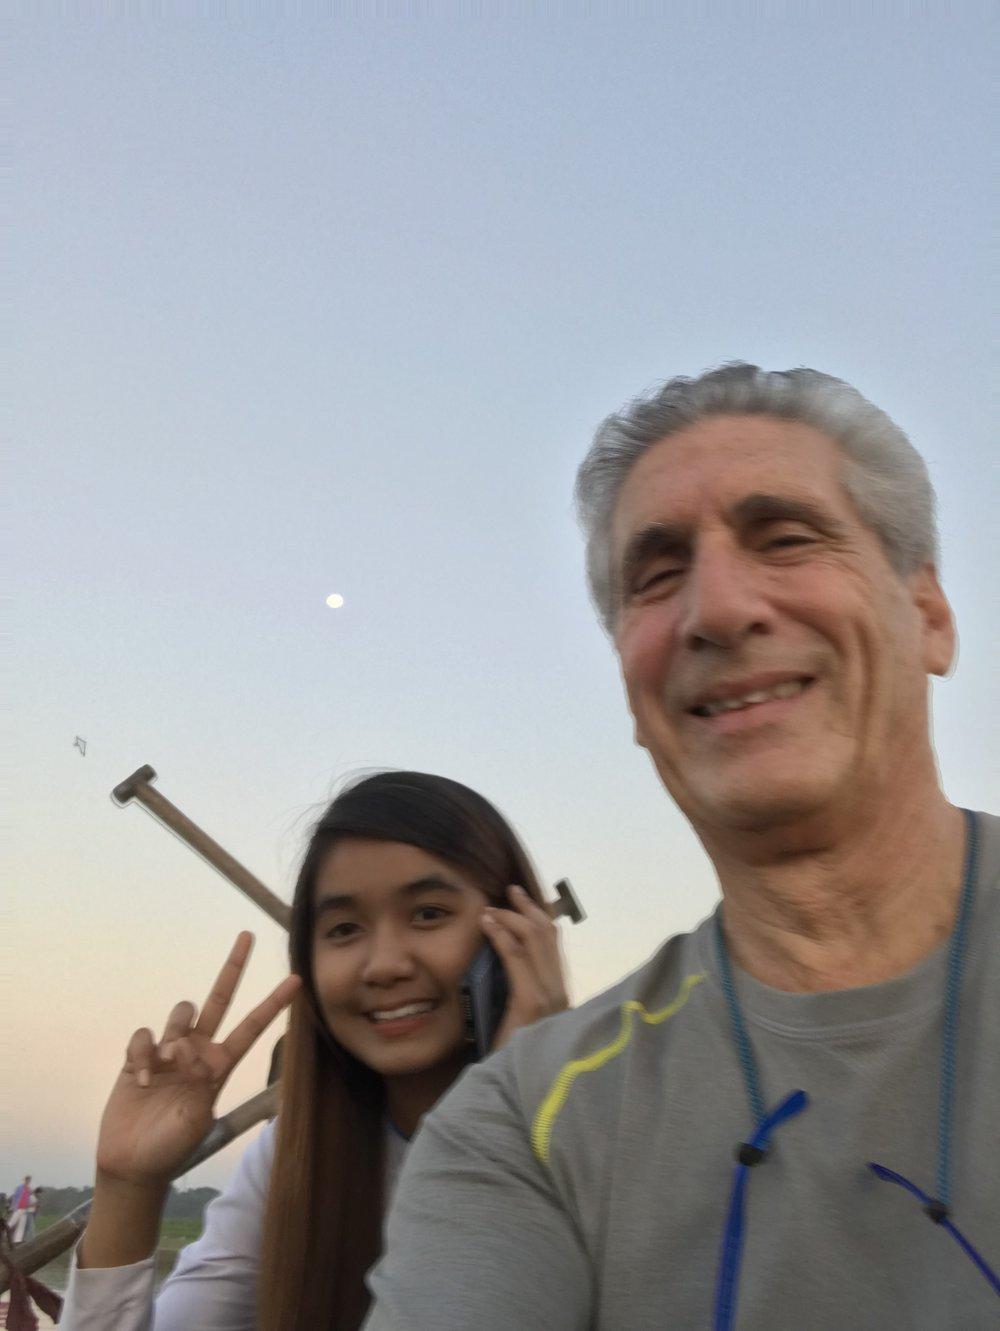 Selfie w Michelle 1.jpg*.jpg